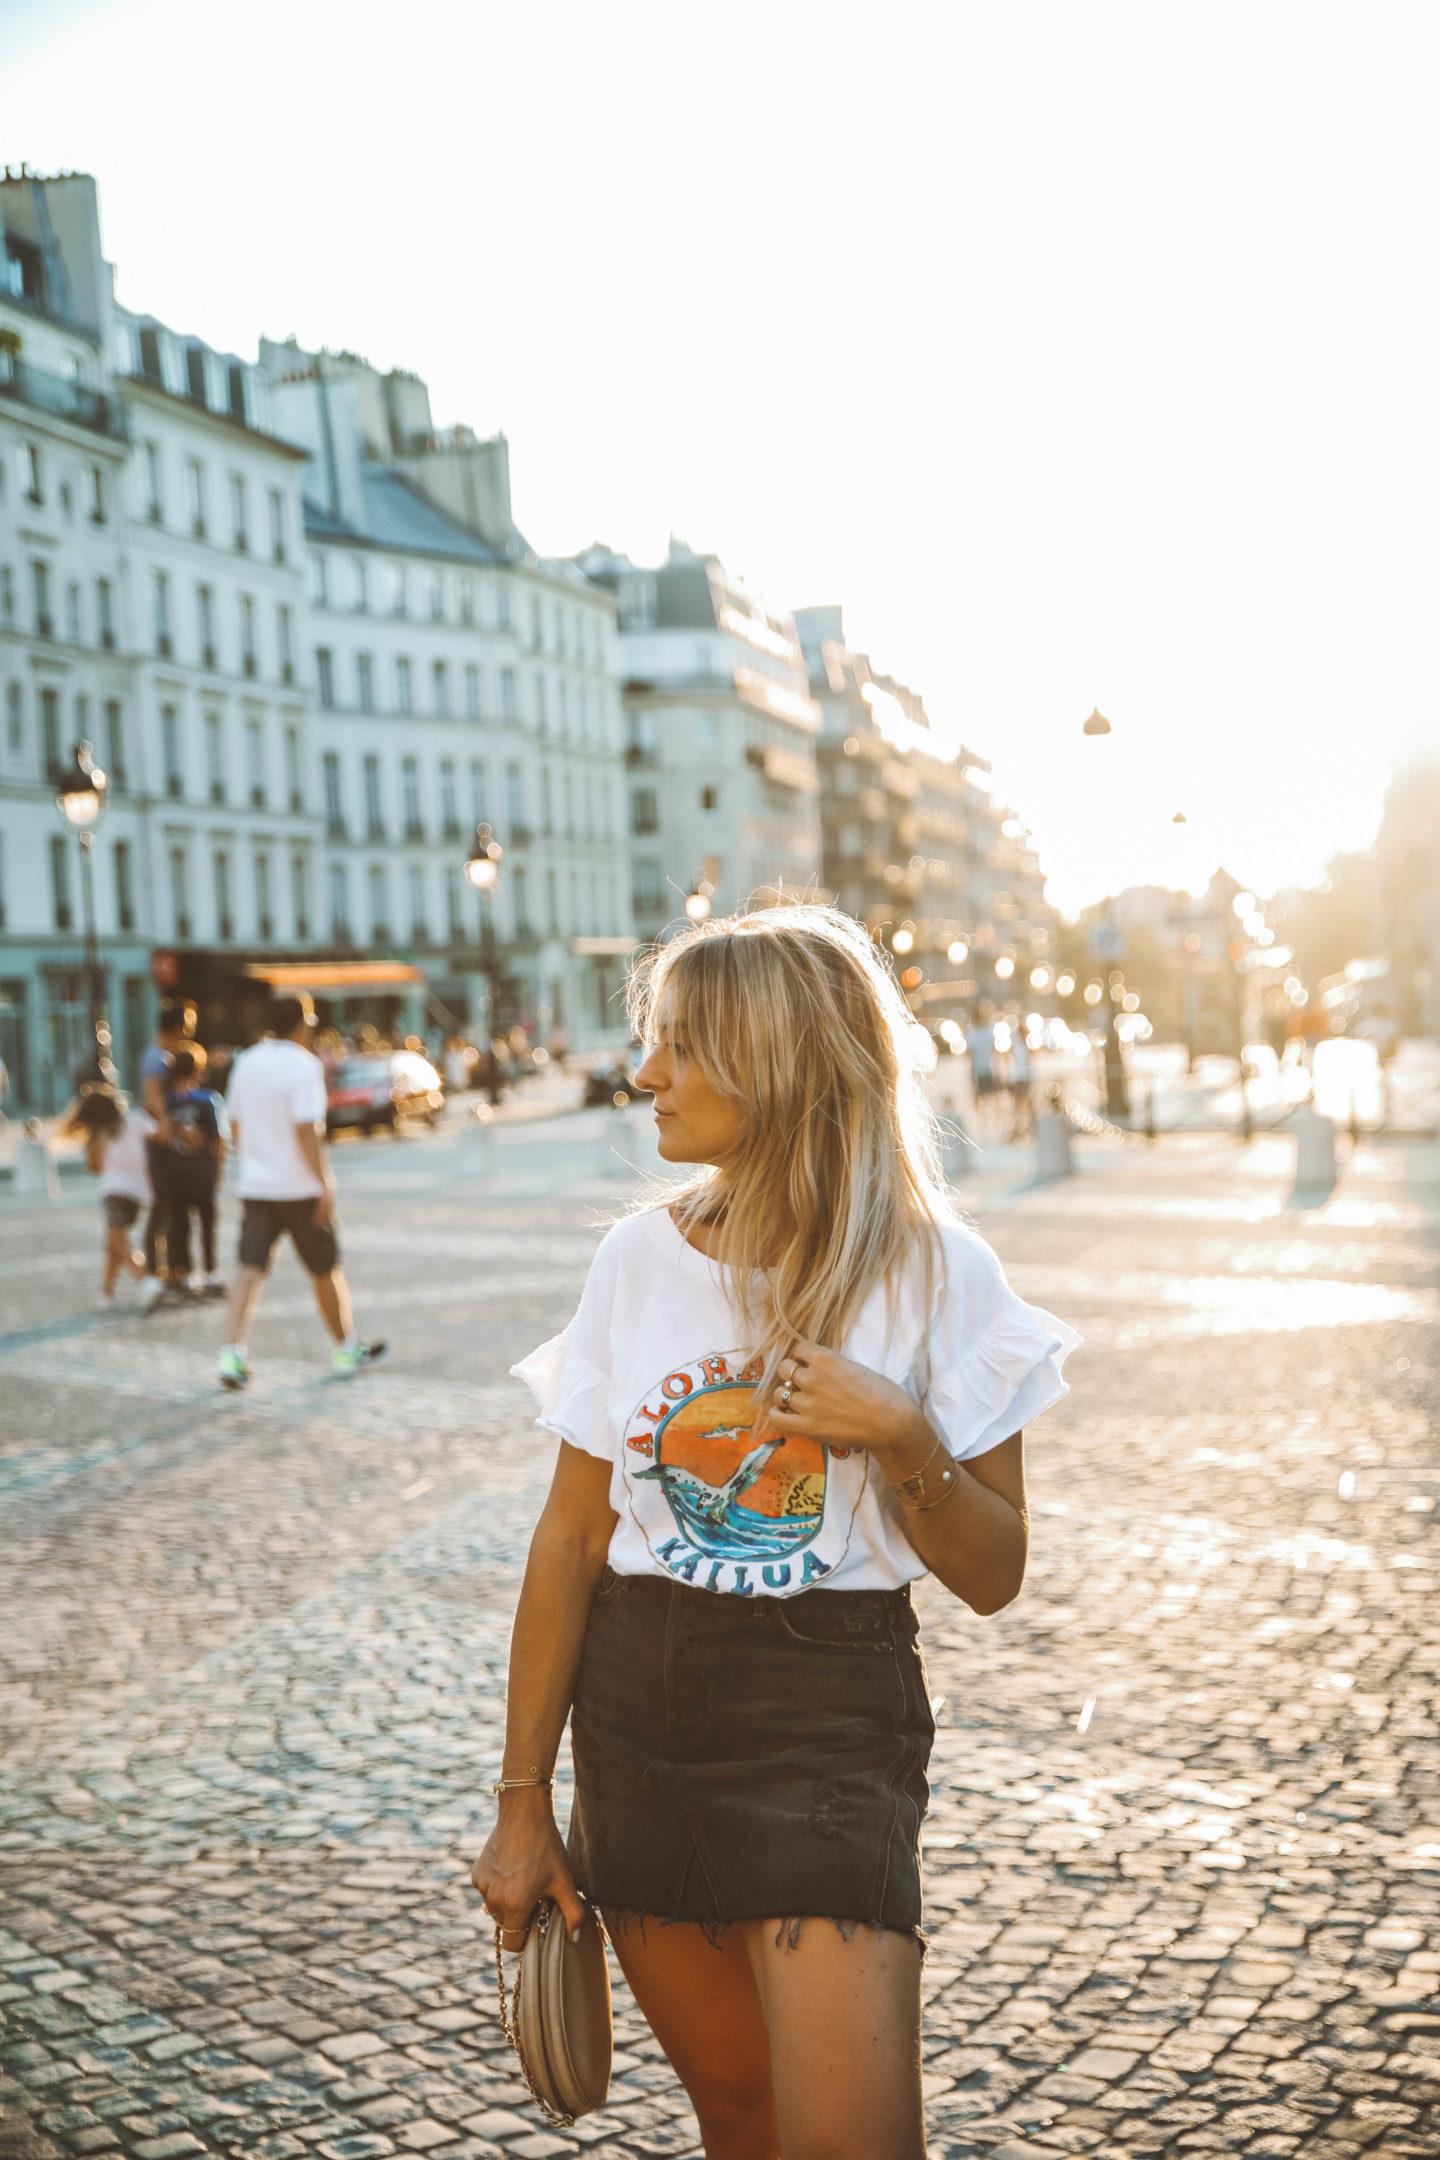 T-shirt Leon and Harper - Blondie Baby blog mode Paris et voyages